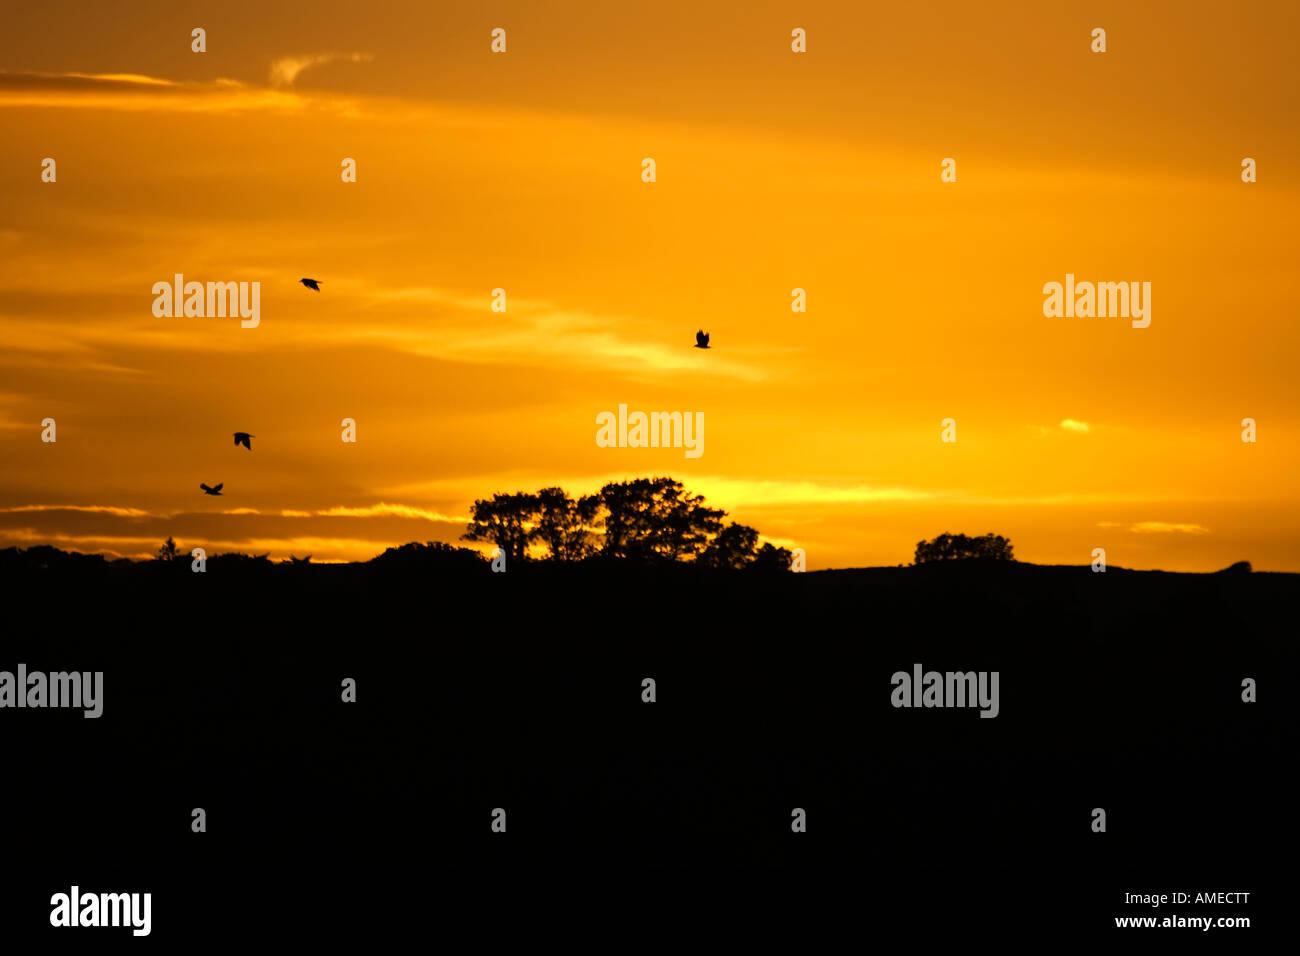 Birds flying across a sunset - Stock Image